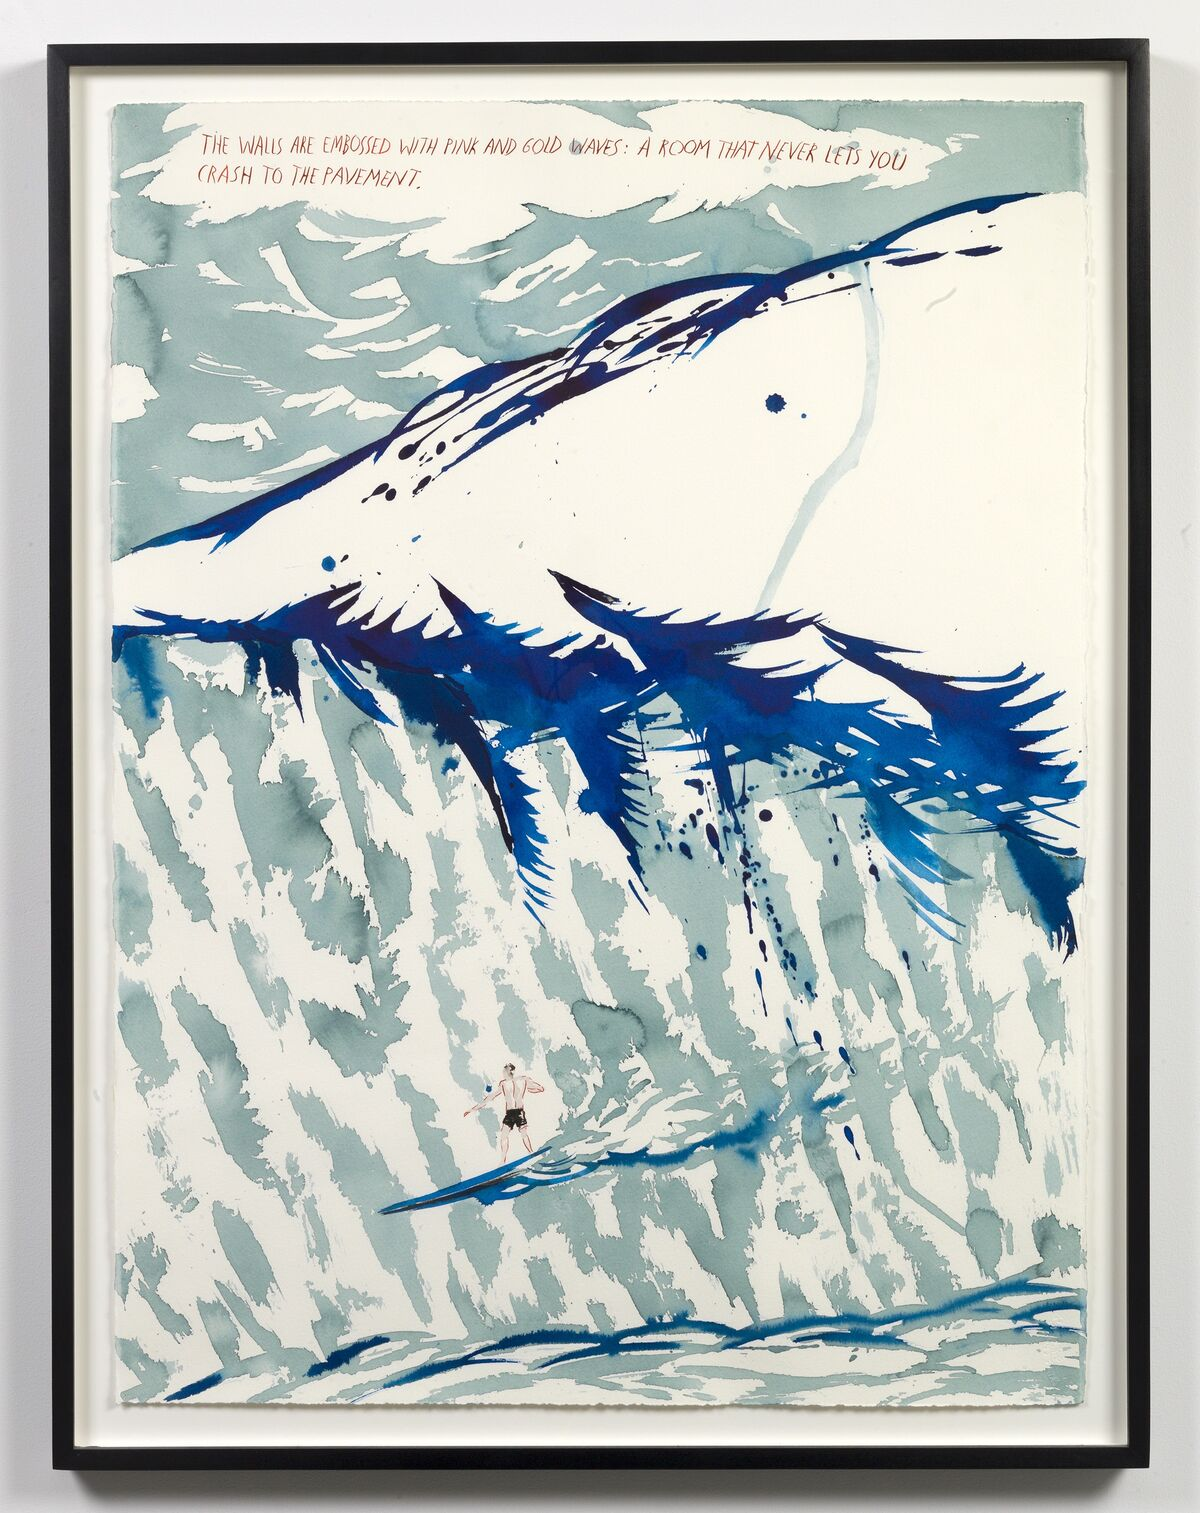 Raymond Pettibon, No title (The walls are...), 1997. Courtesy of David Zwirner, New York.